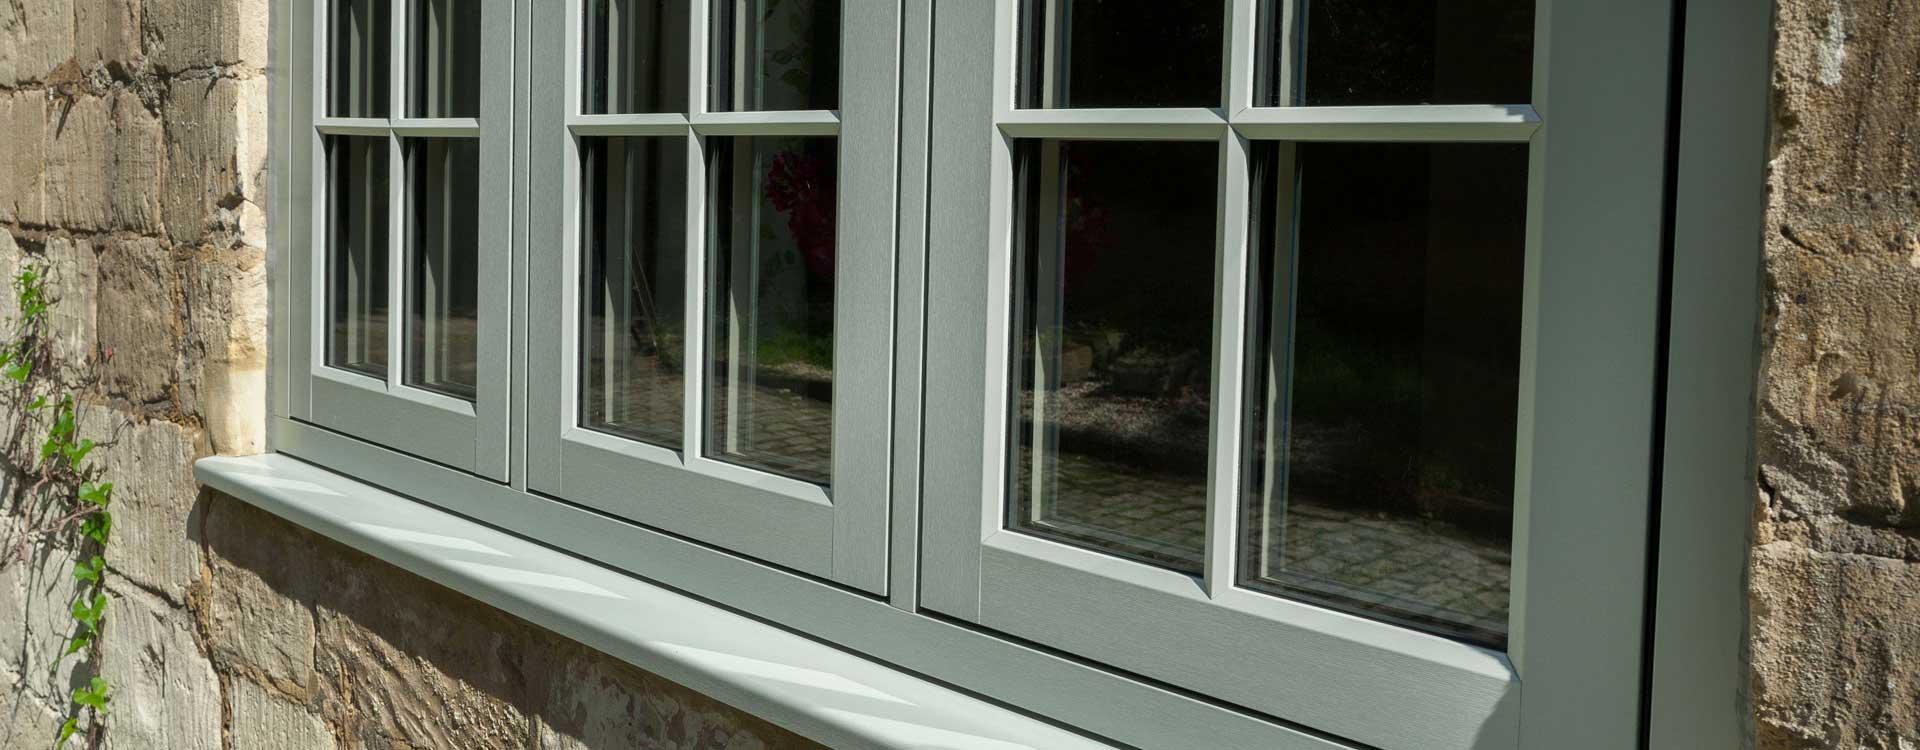 R9 Windows 26 Malvern Glass